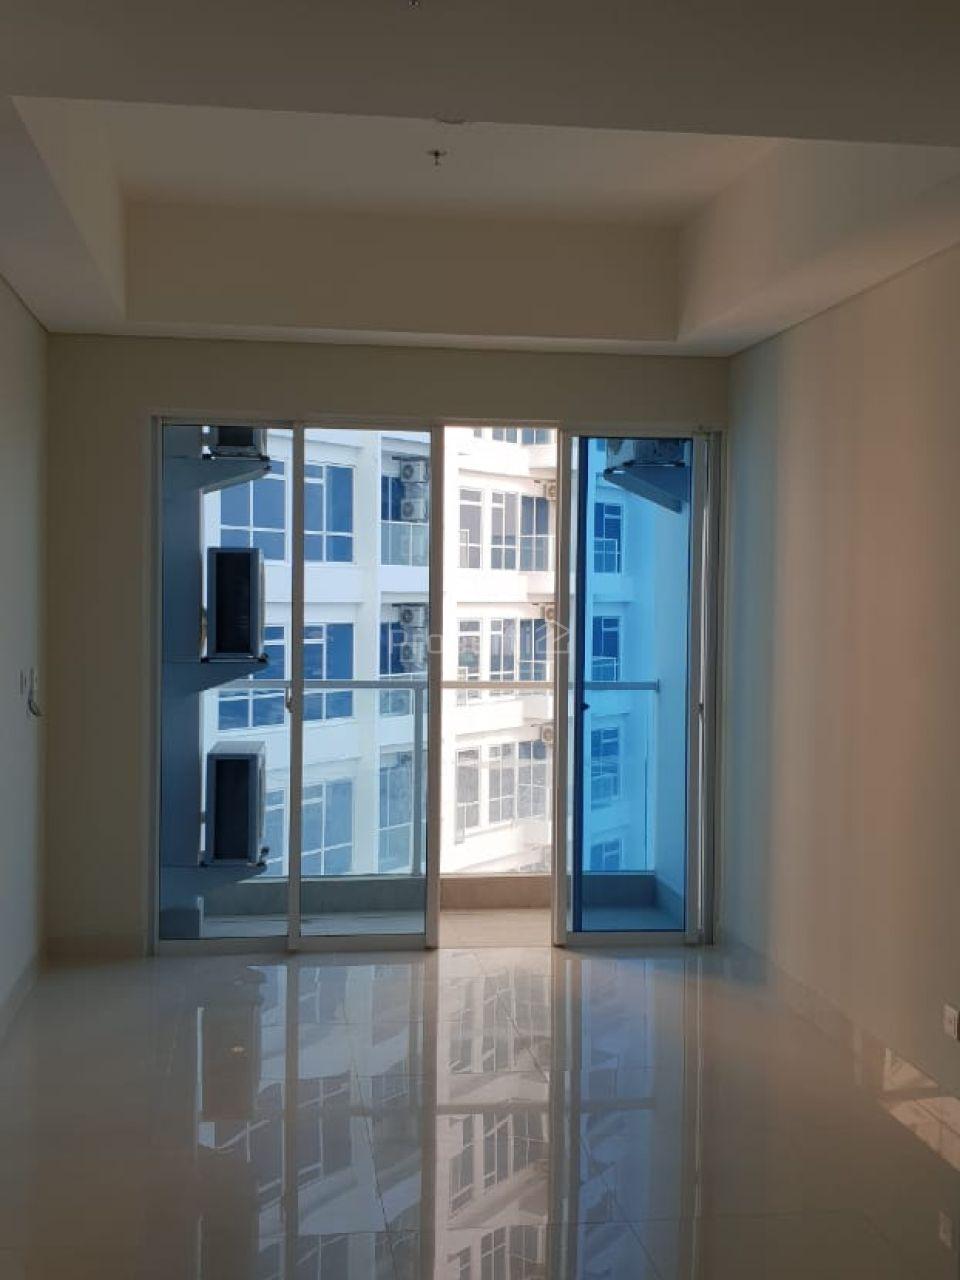 Unit 3 KT Brand New di Apartemen Puri Mansion, DKI Jakarta